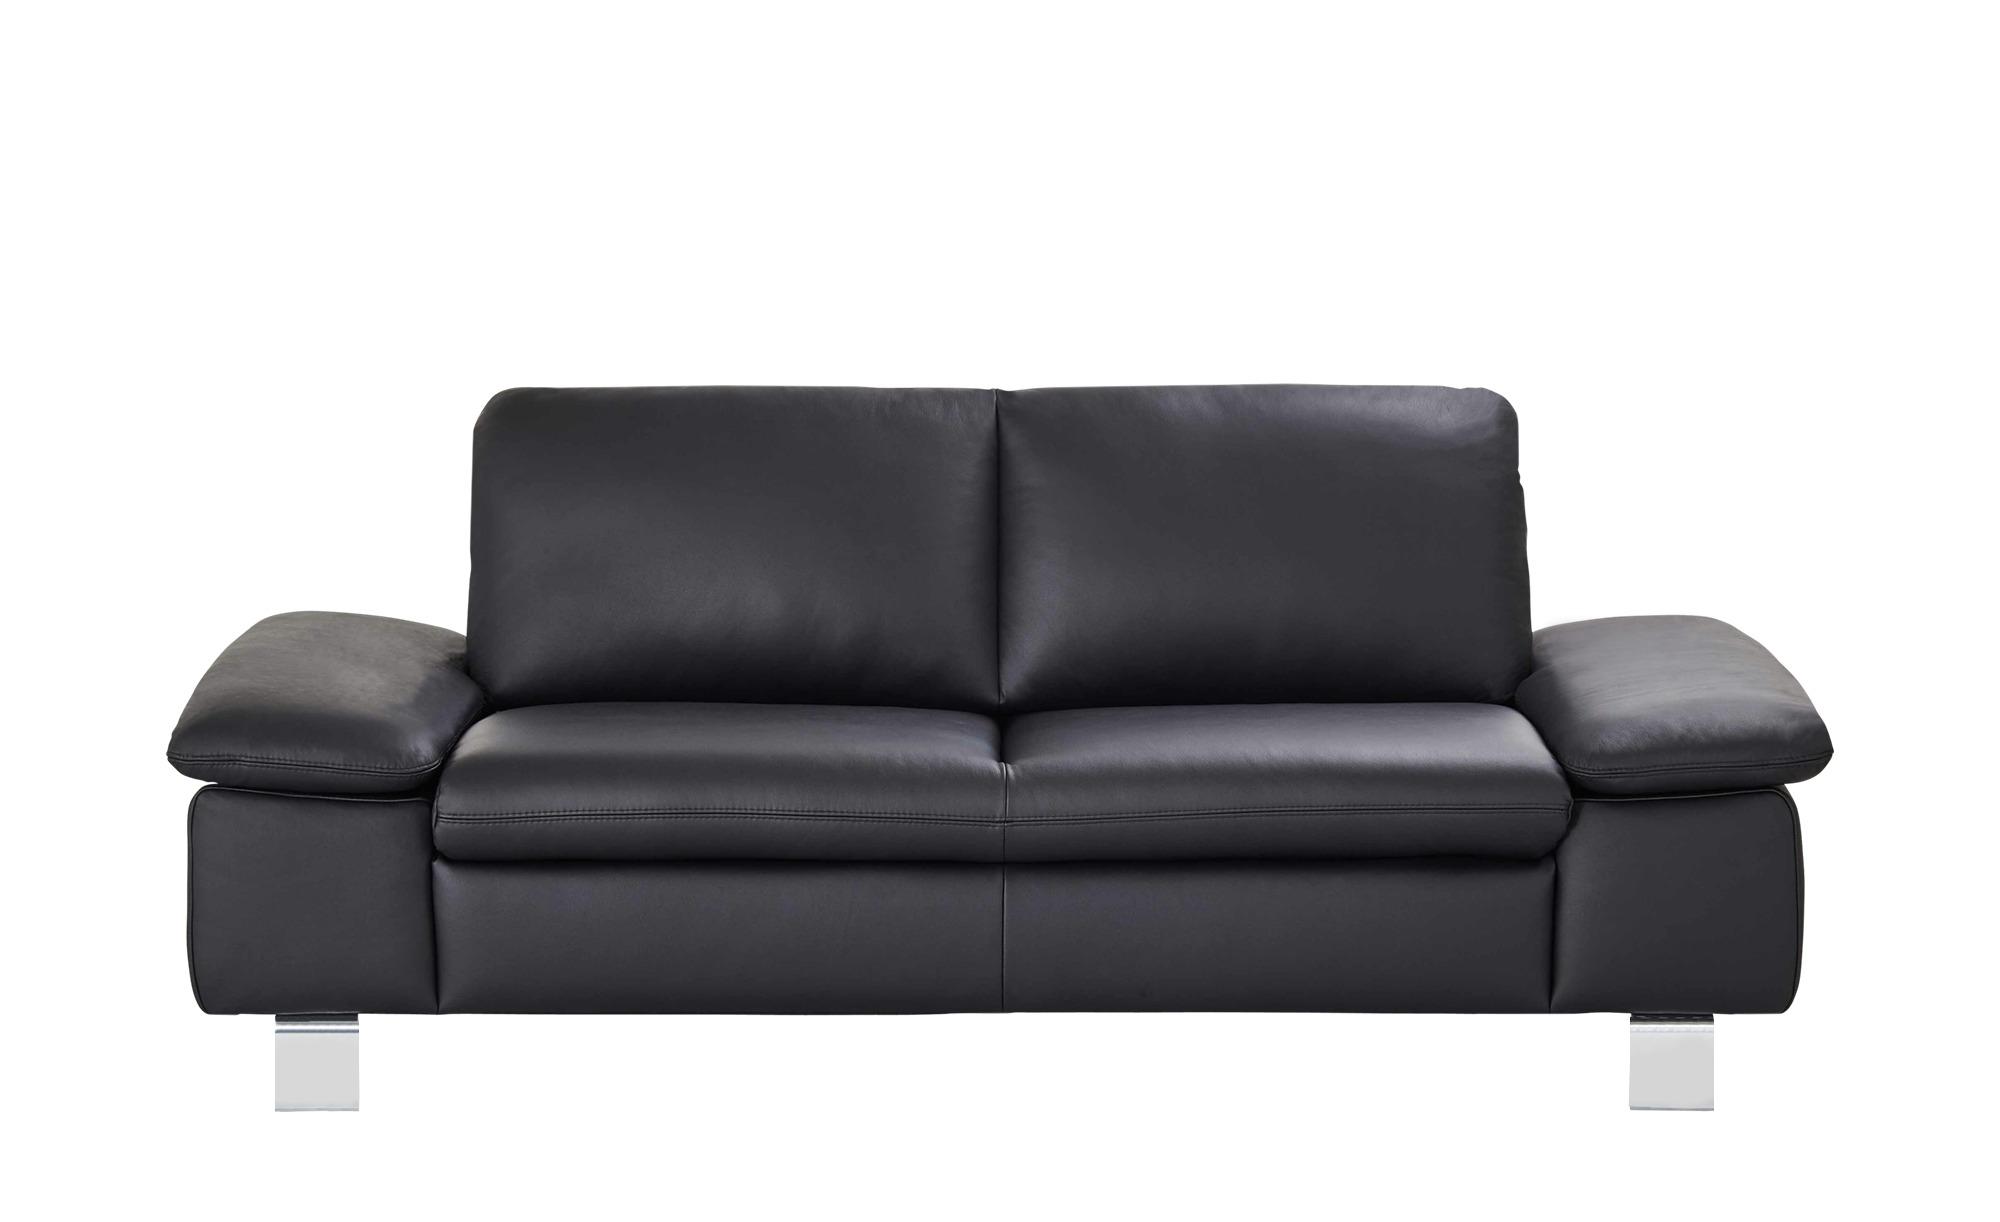 smart sofa finola breite 201 cm h he 83 cm online kaufen. Black Bedroom Furniture Sets. Home Design Ideas